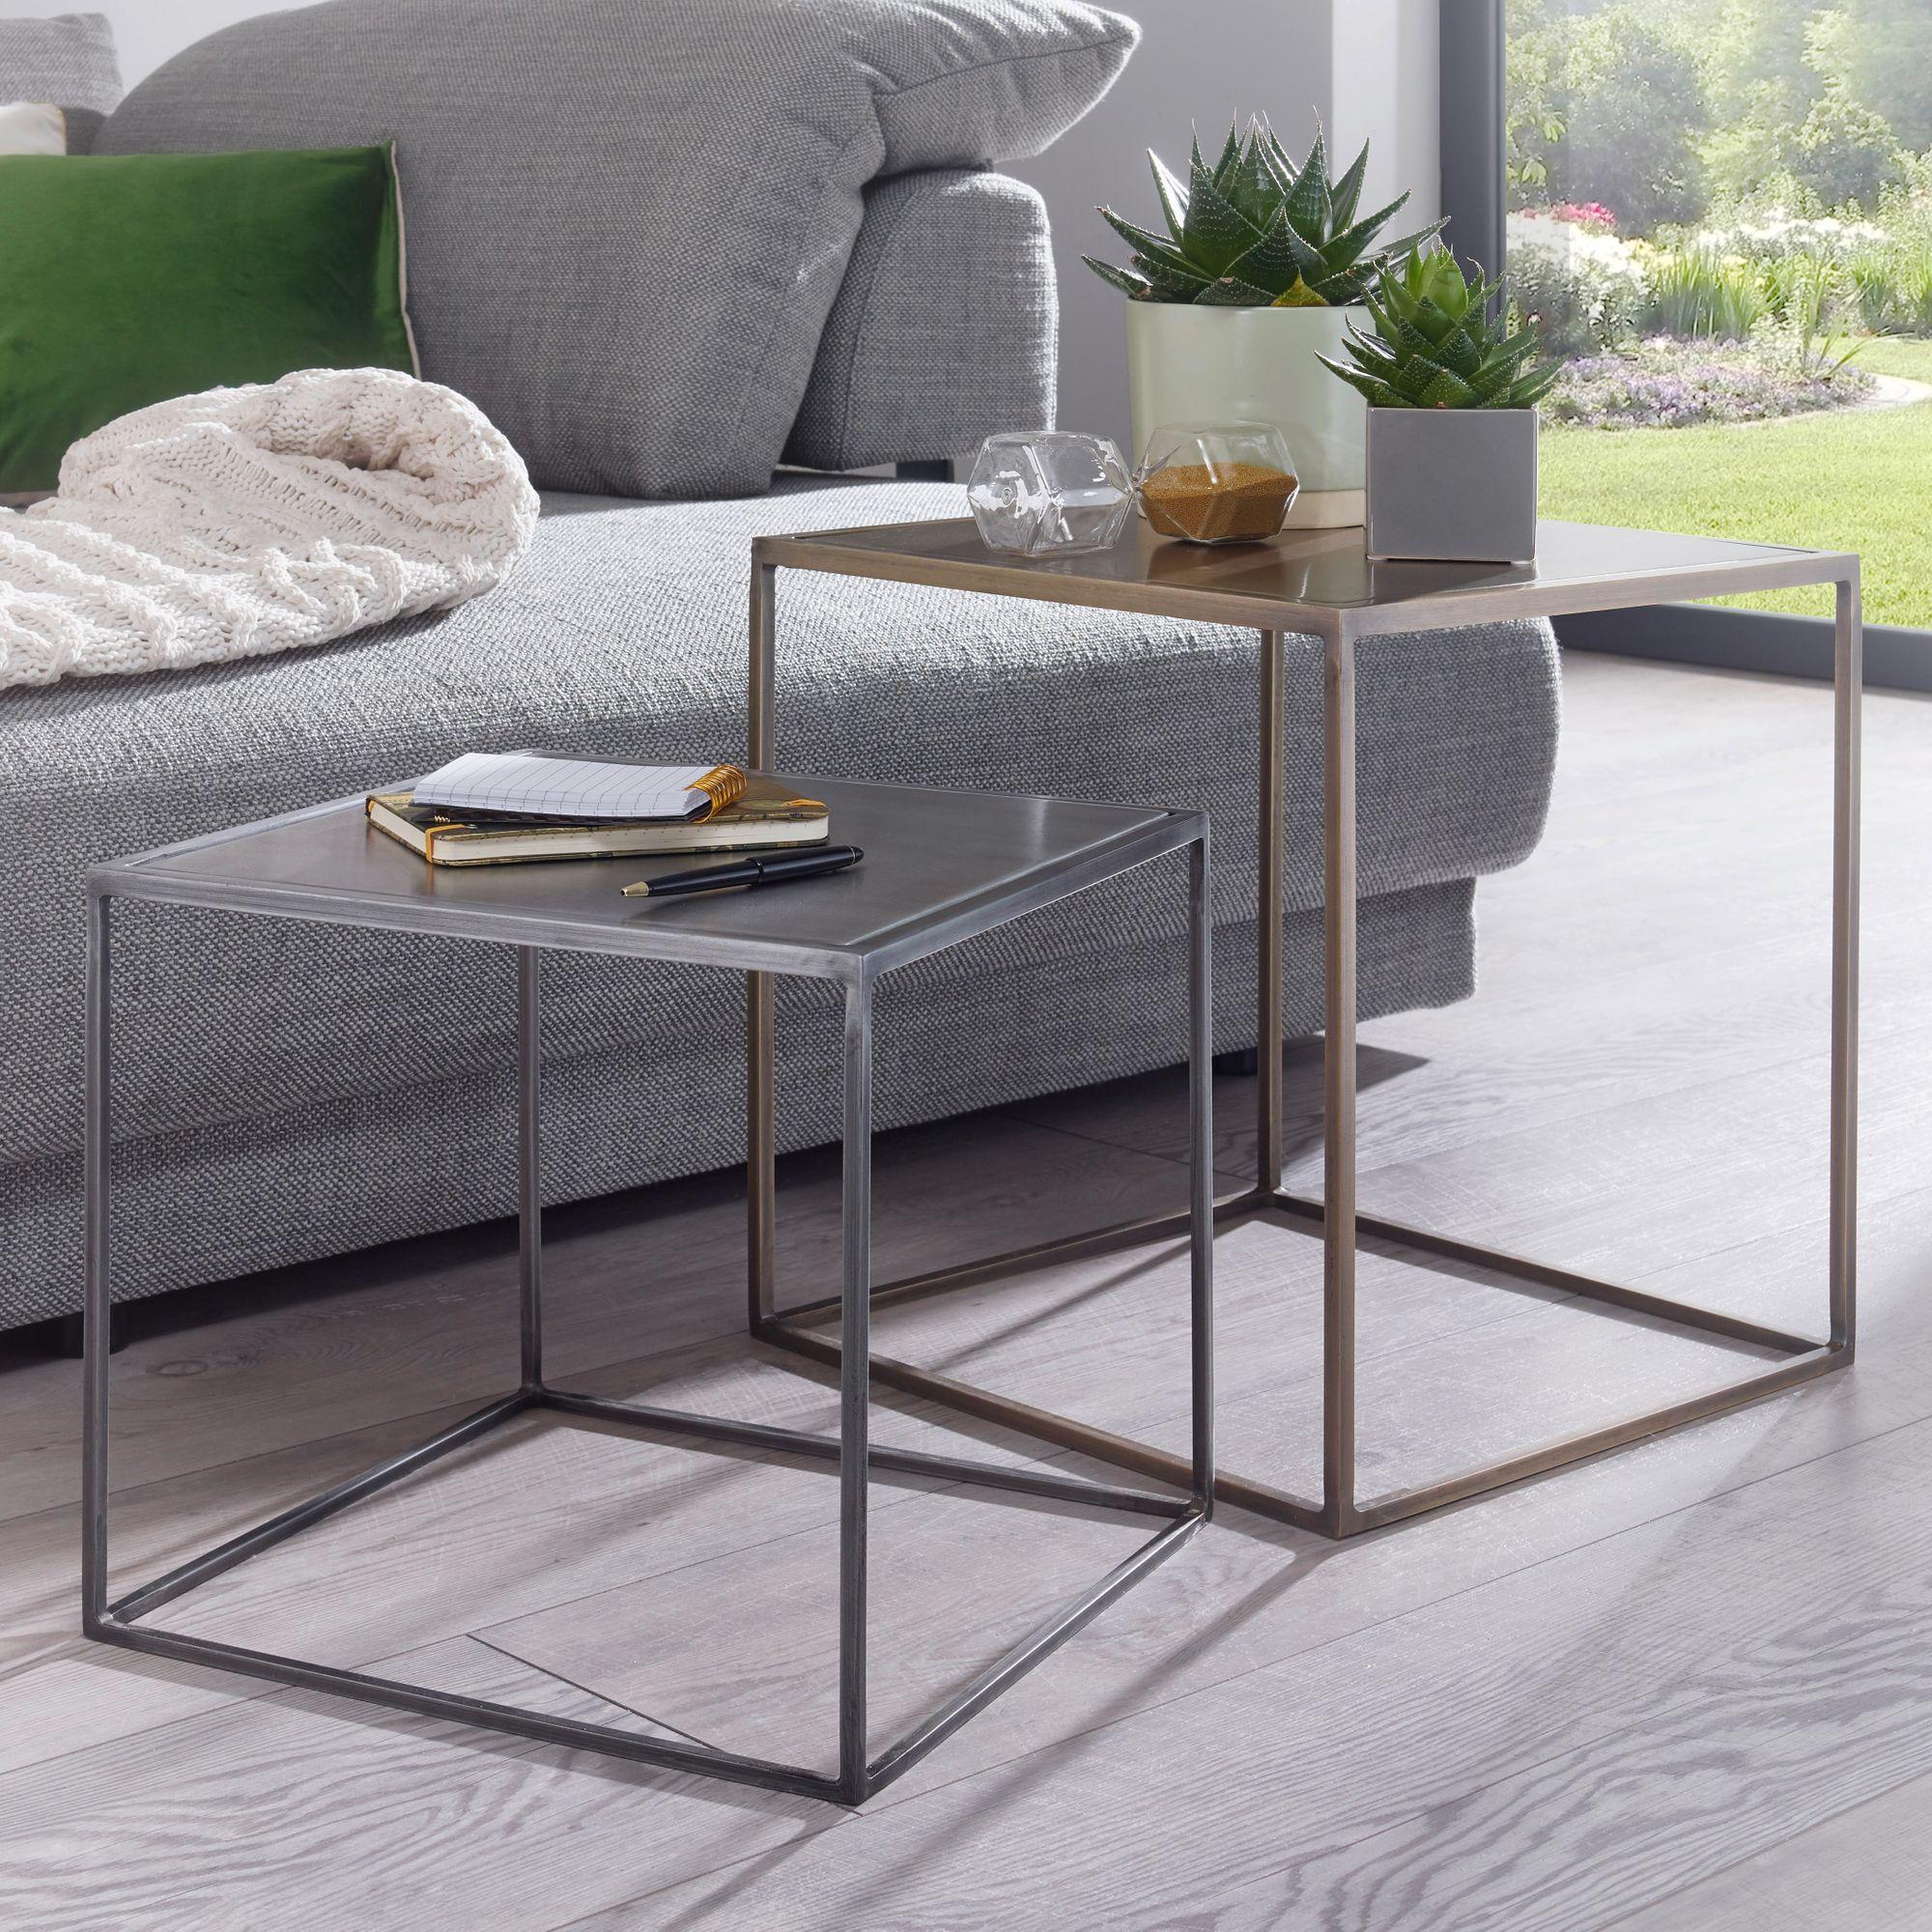 couchtisch eckig amazing couchtisch eckig in worpswede with couchtisch eckig fabulous herrlich. Black Bedroom Furniture Sets. Home Design Ideas